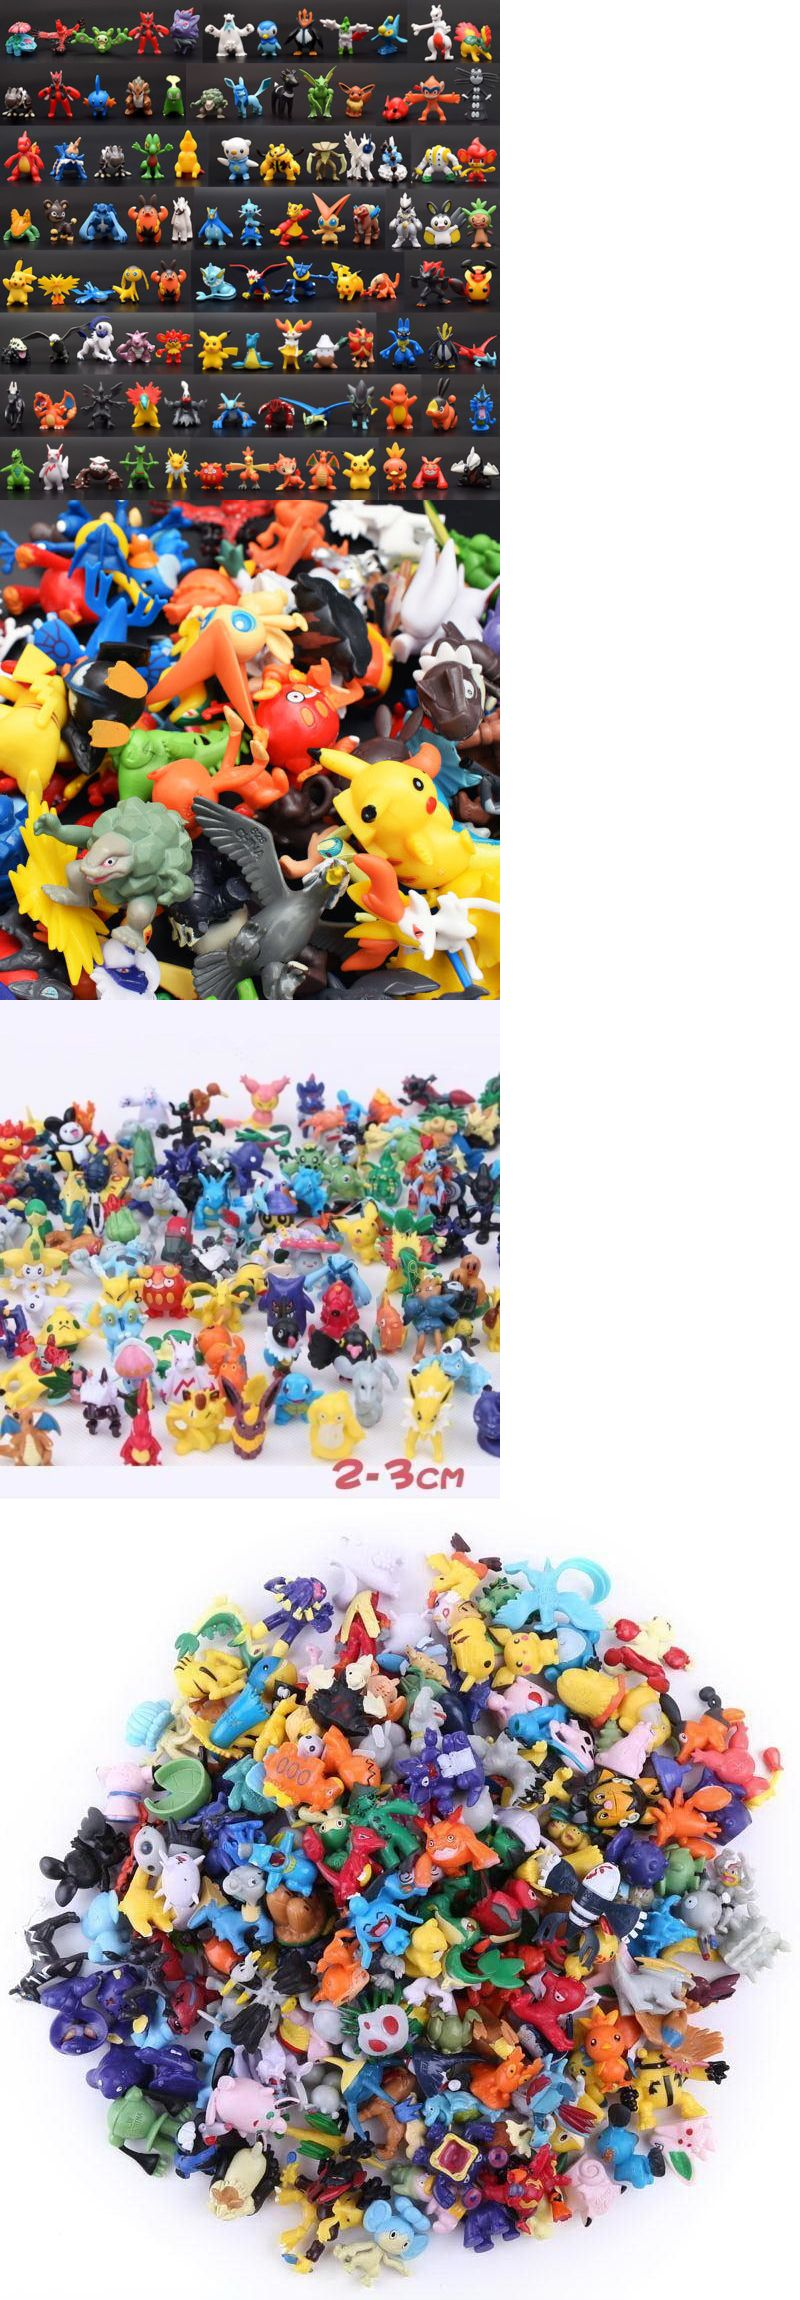 Ben 10 toys images  Pcs Pokemon Pocket Mini cm Pearl Action Figures Kids Toys